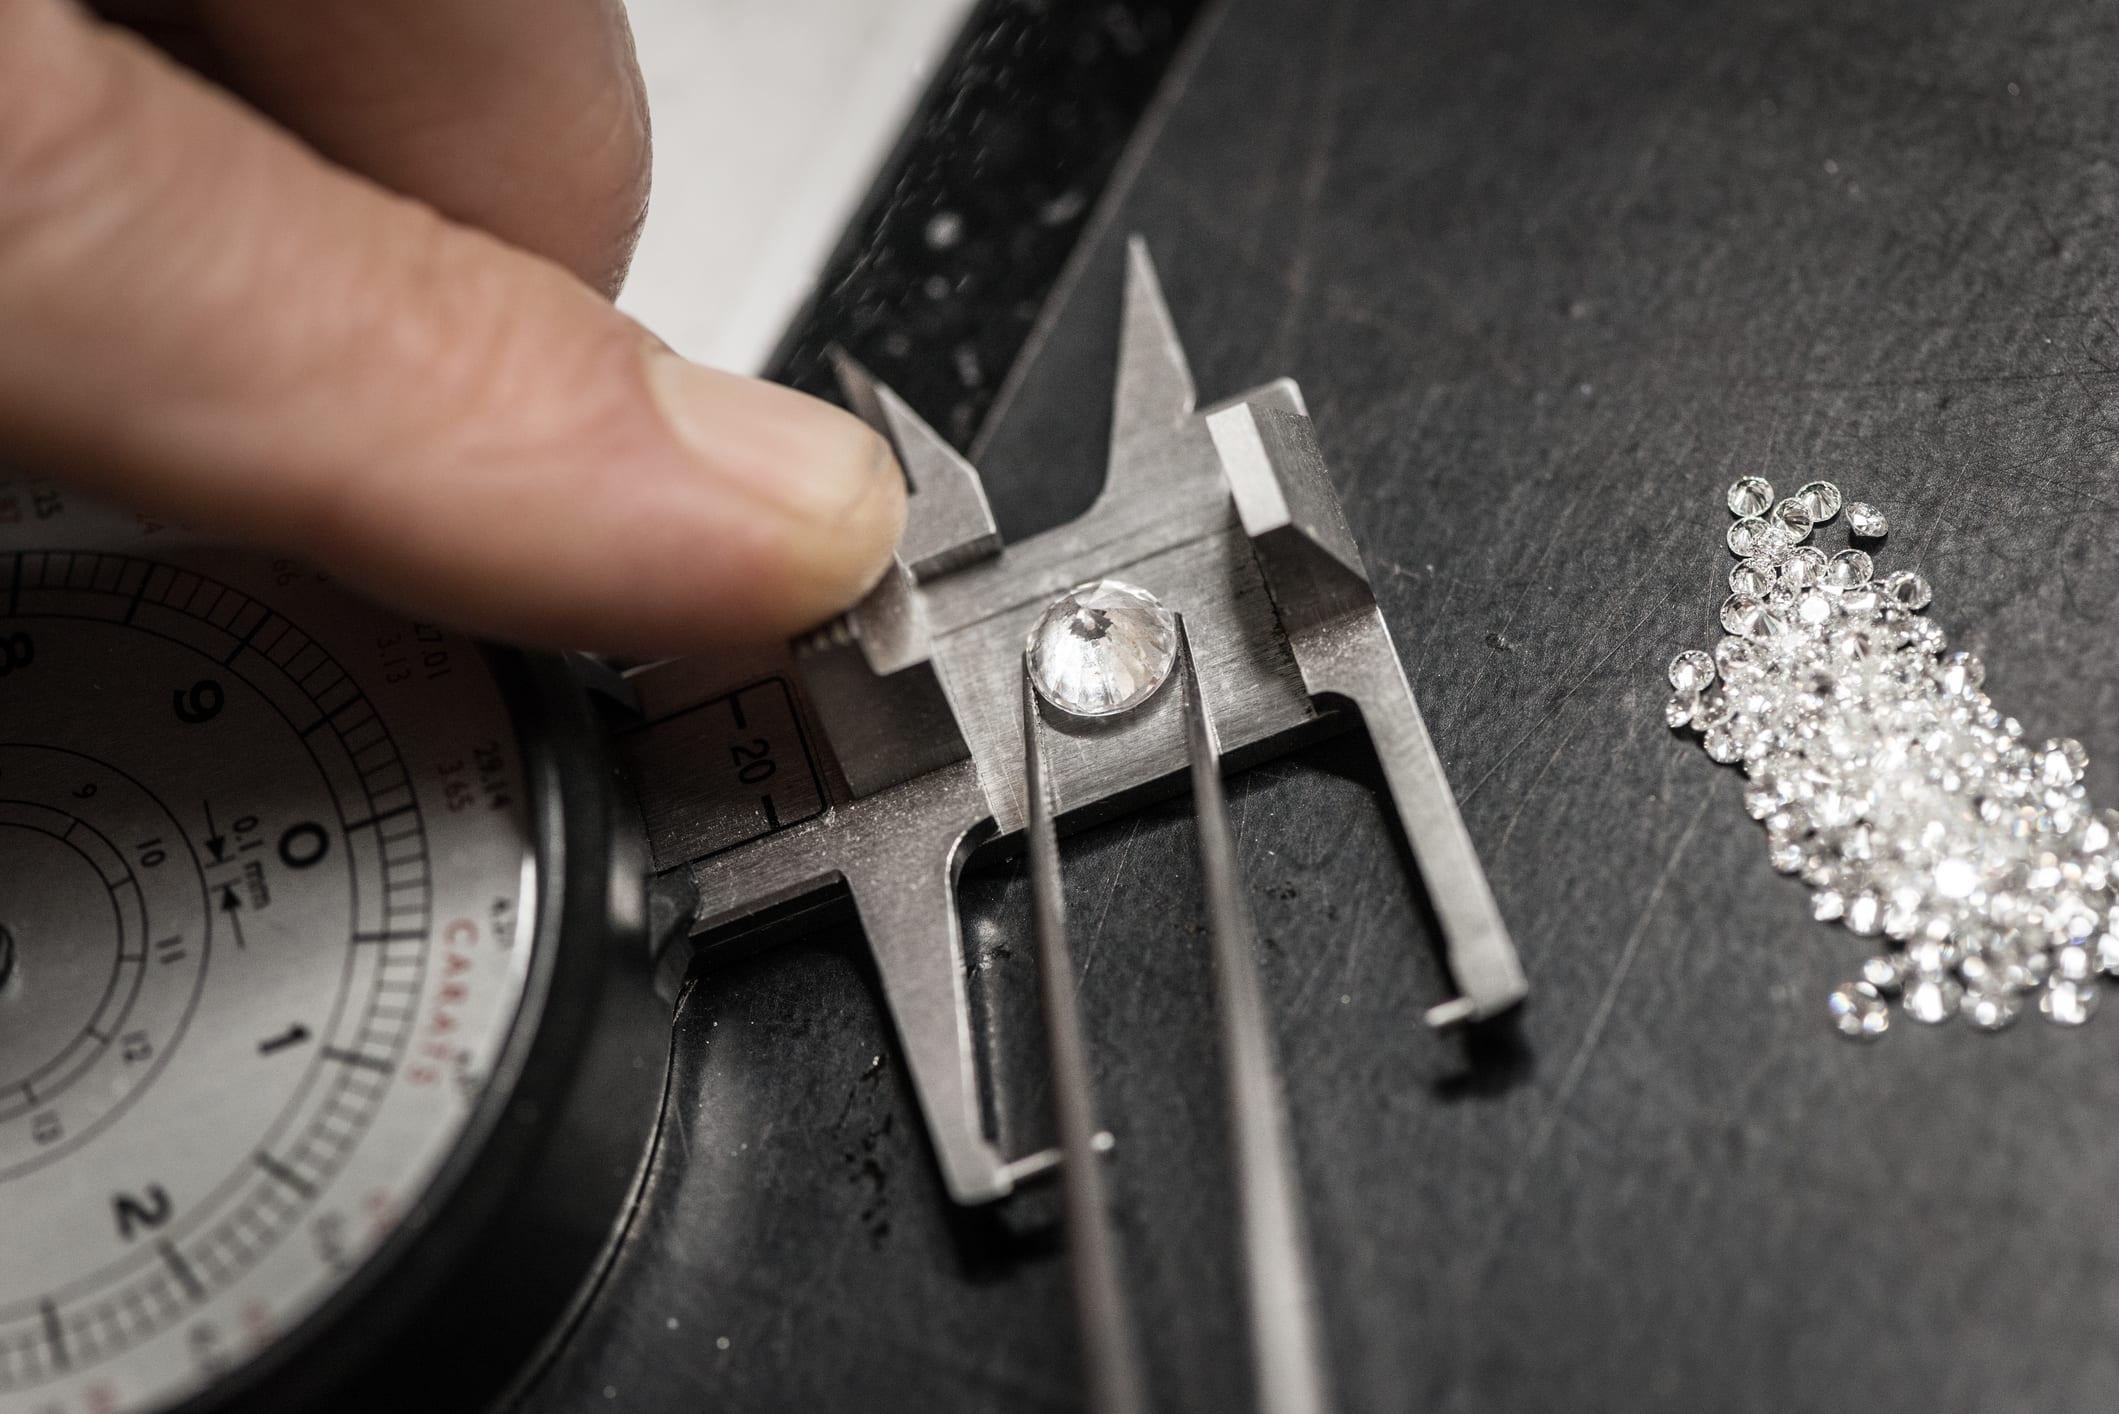 Professional gemstone settings jewellery craft laboratory: Choosing diamonds